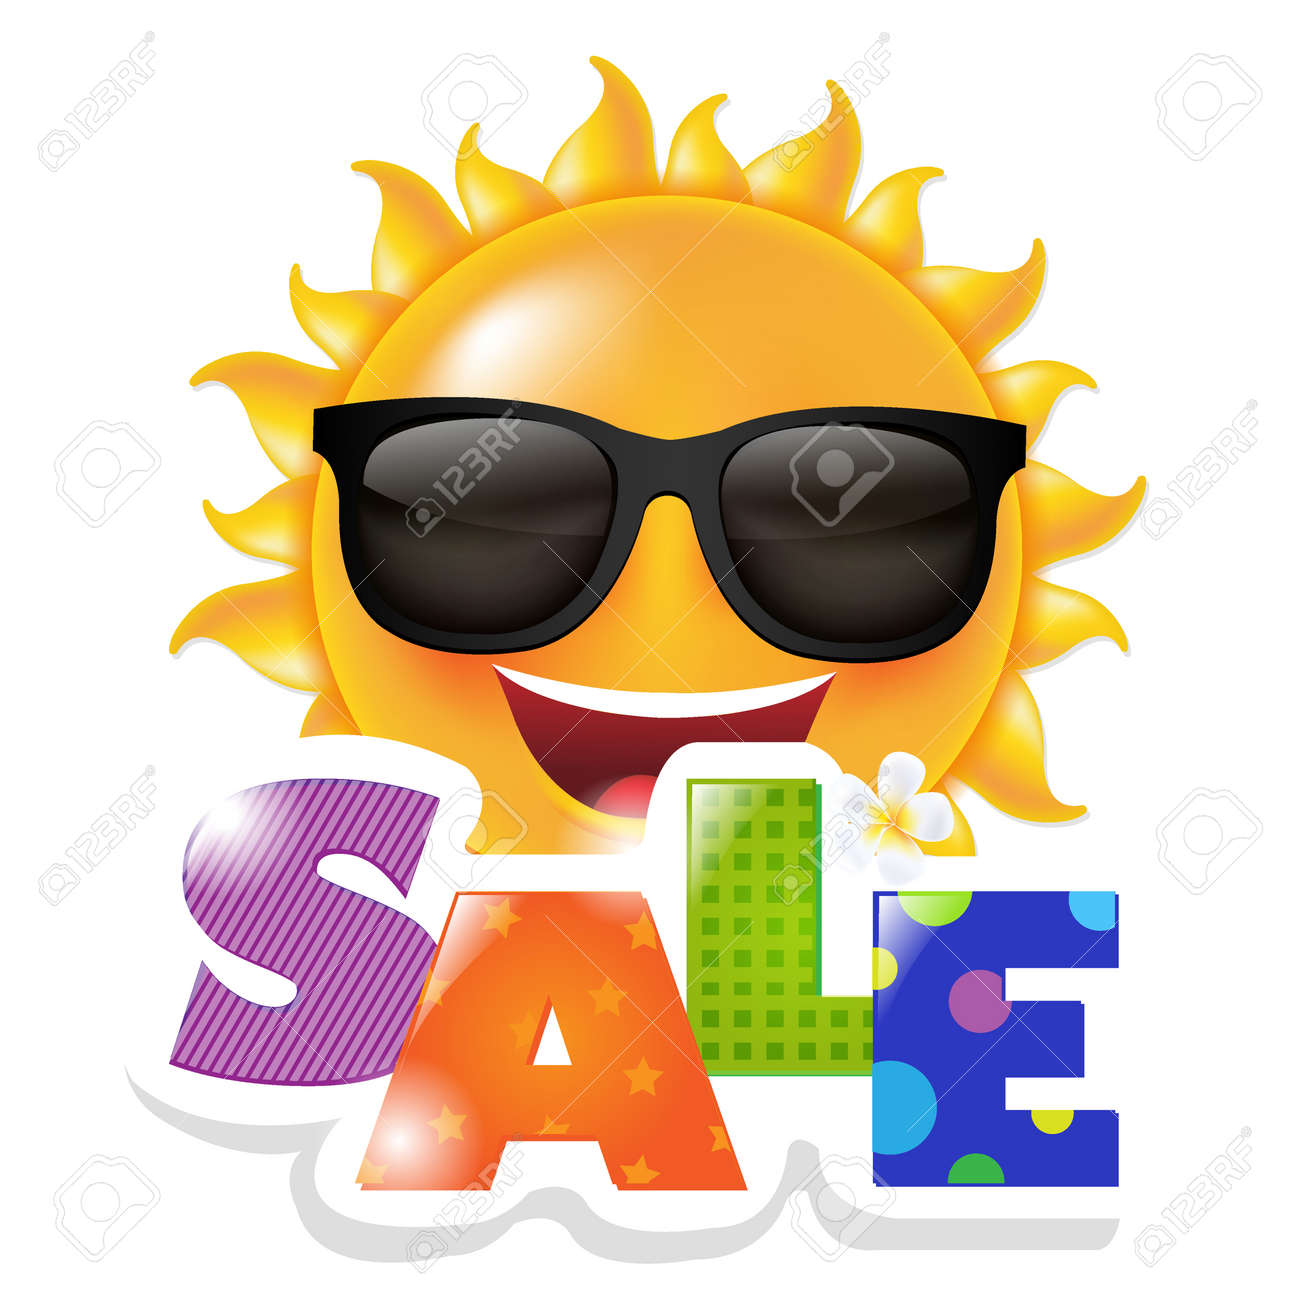 Sun Smile Sale, With Gradient Mesh, Vector Illustration - 165095361